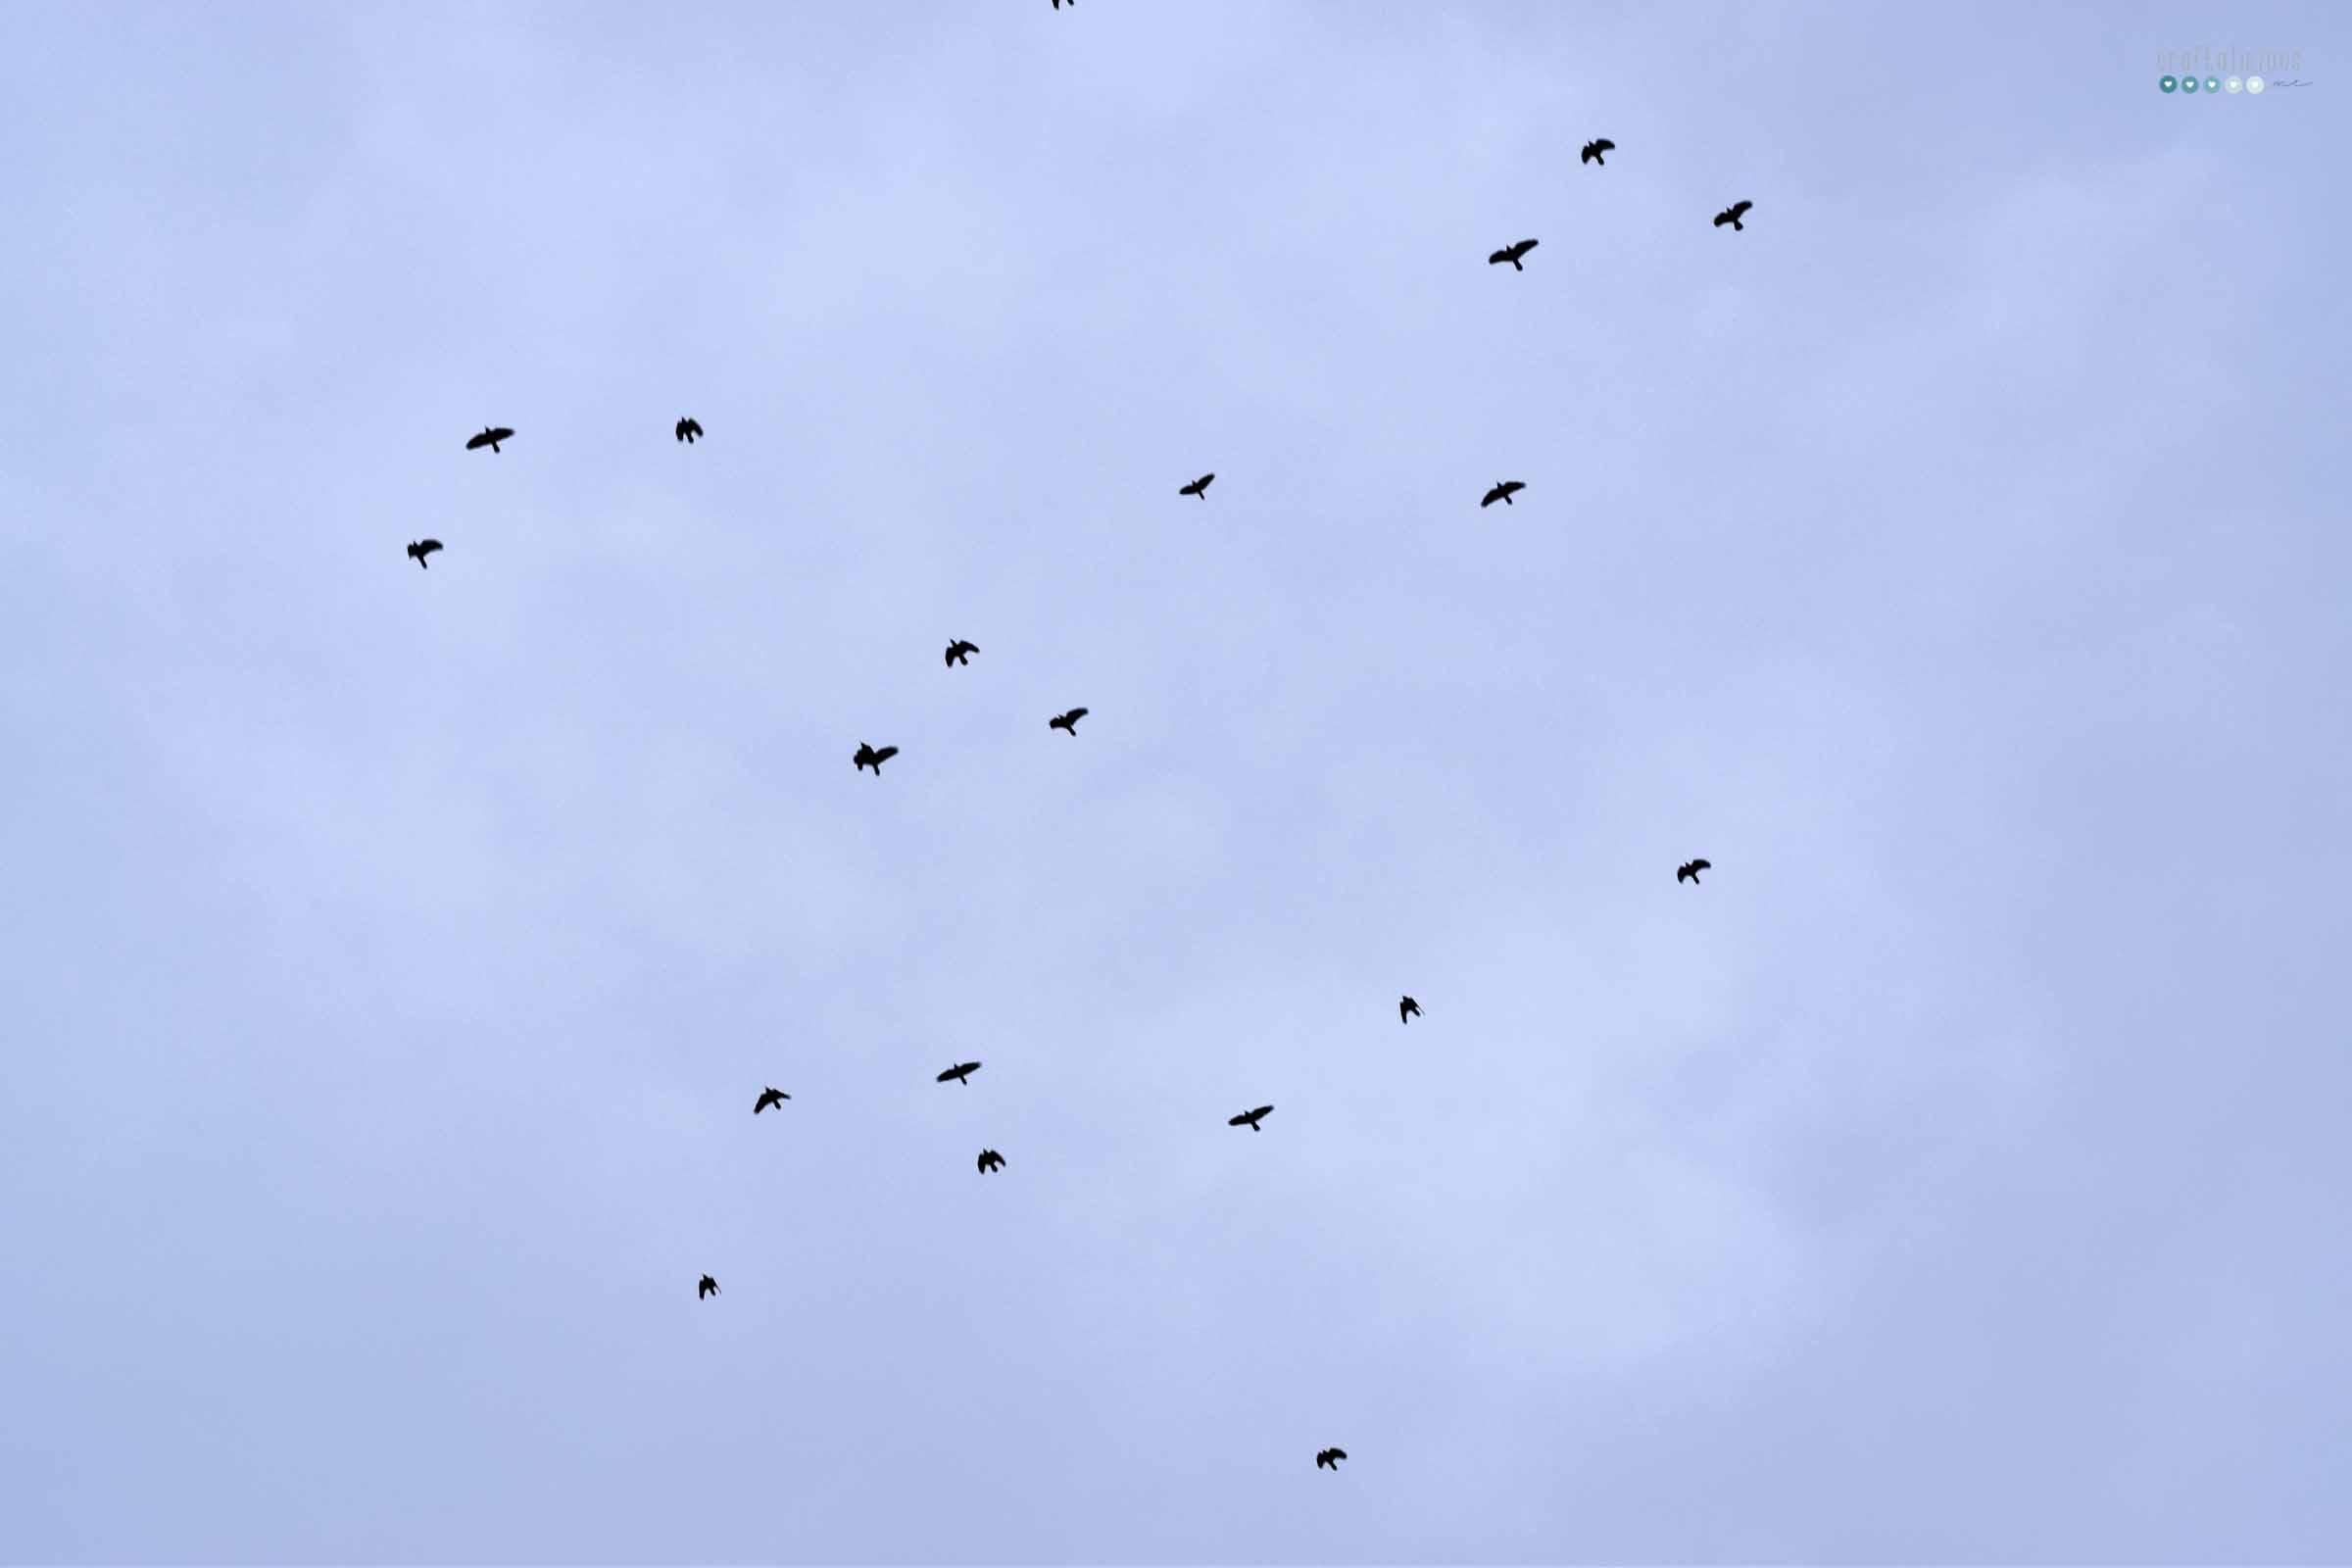 currently in march craftaliciousme seeking creative life birds in blue sky